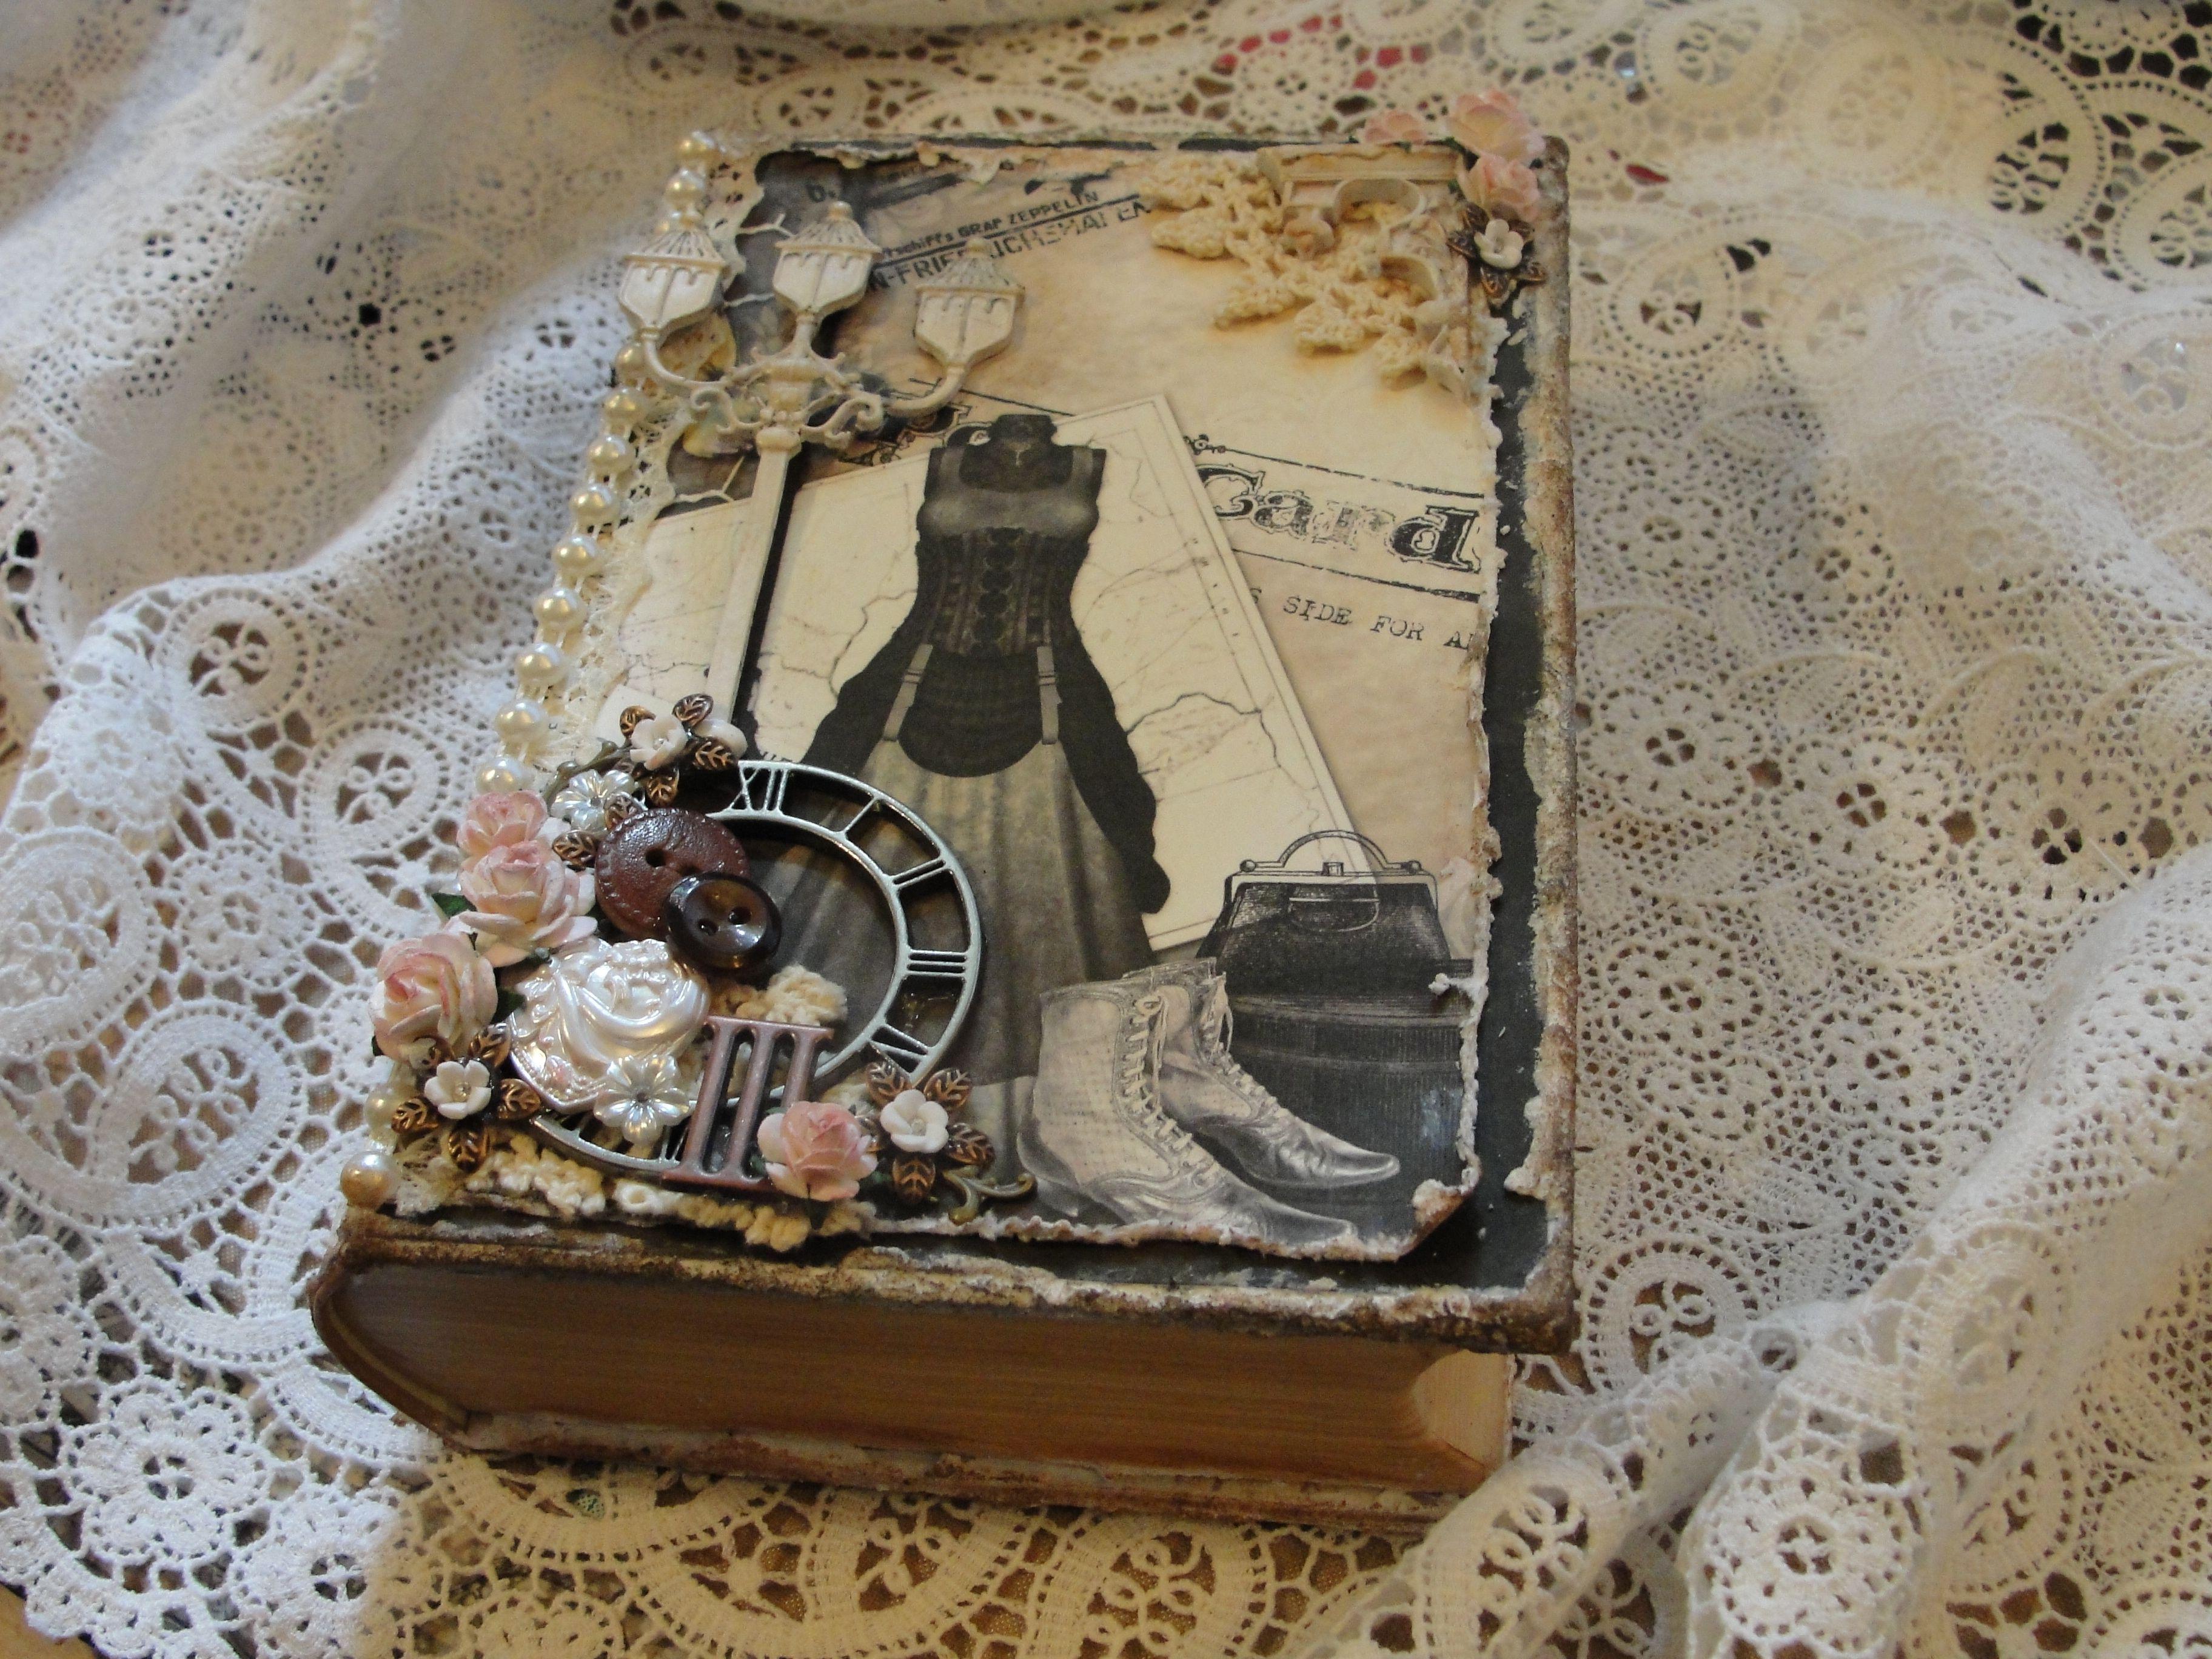 My altered book/box with Time Traveler digital kit, avail: http://kittylicious11.blogspot.com/2013/08/time-traveler-printable-kit-10.html